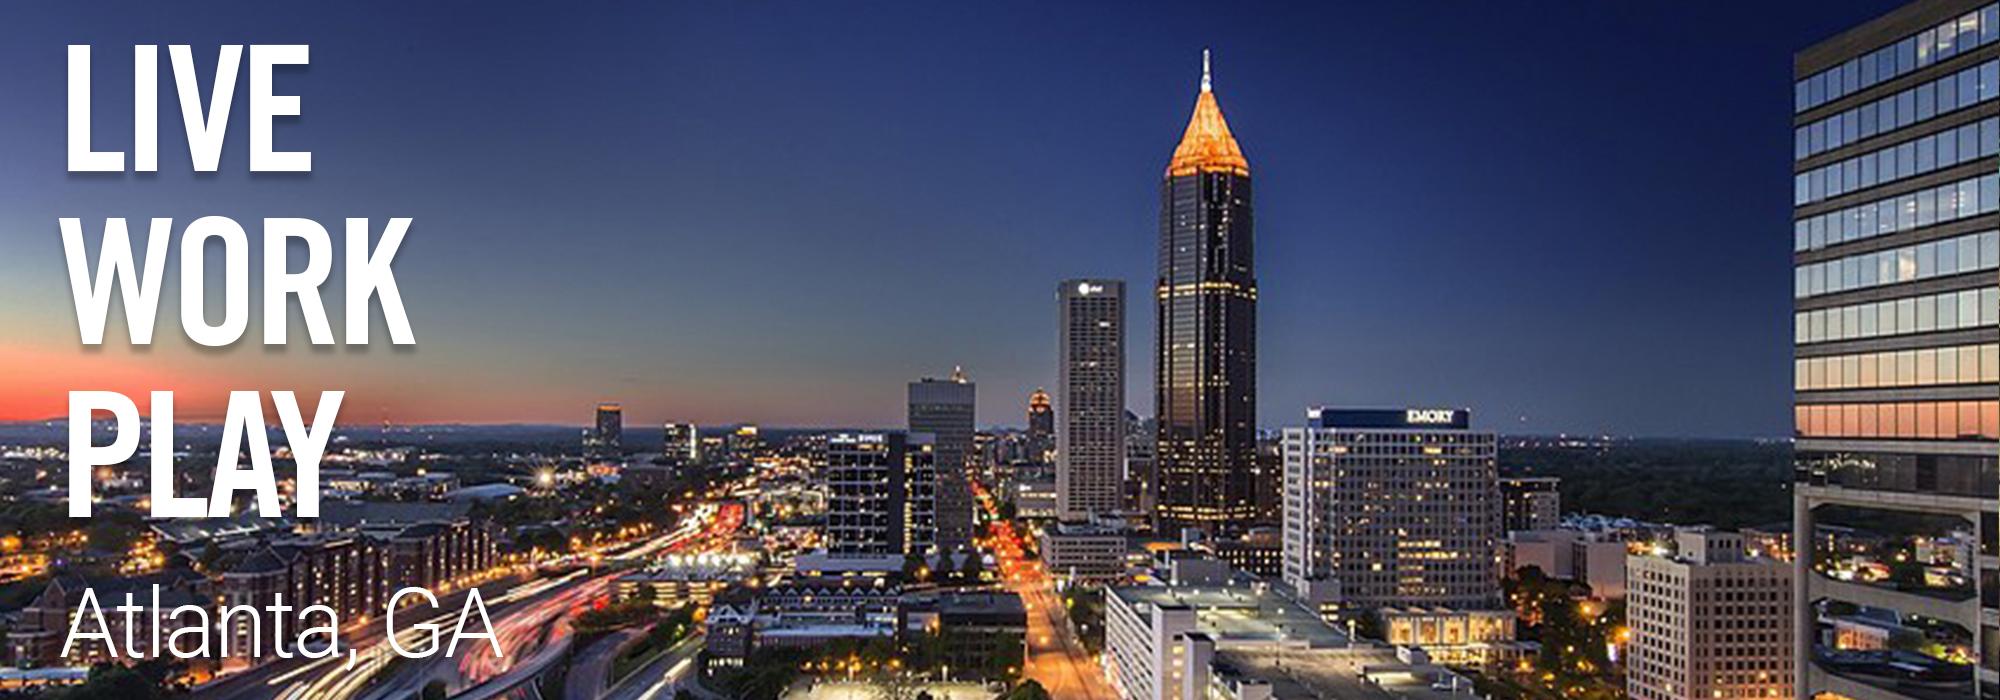 Live Work Play in Atlanta